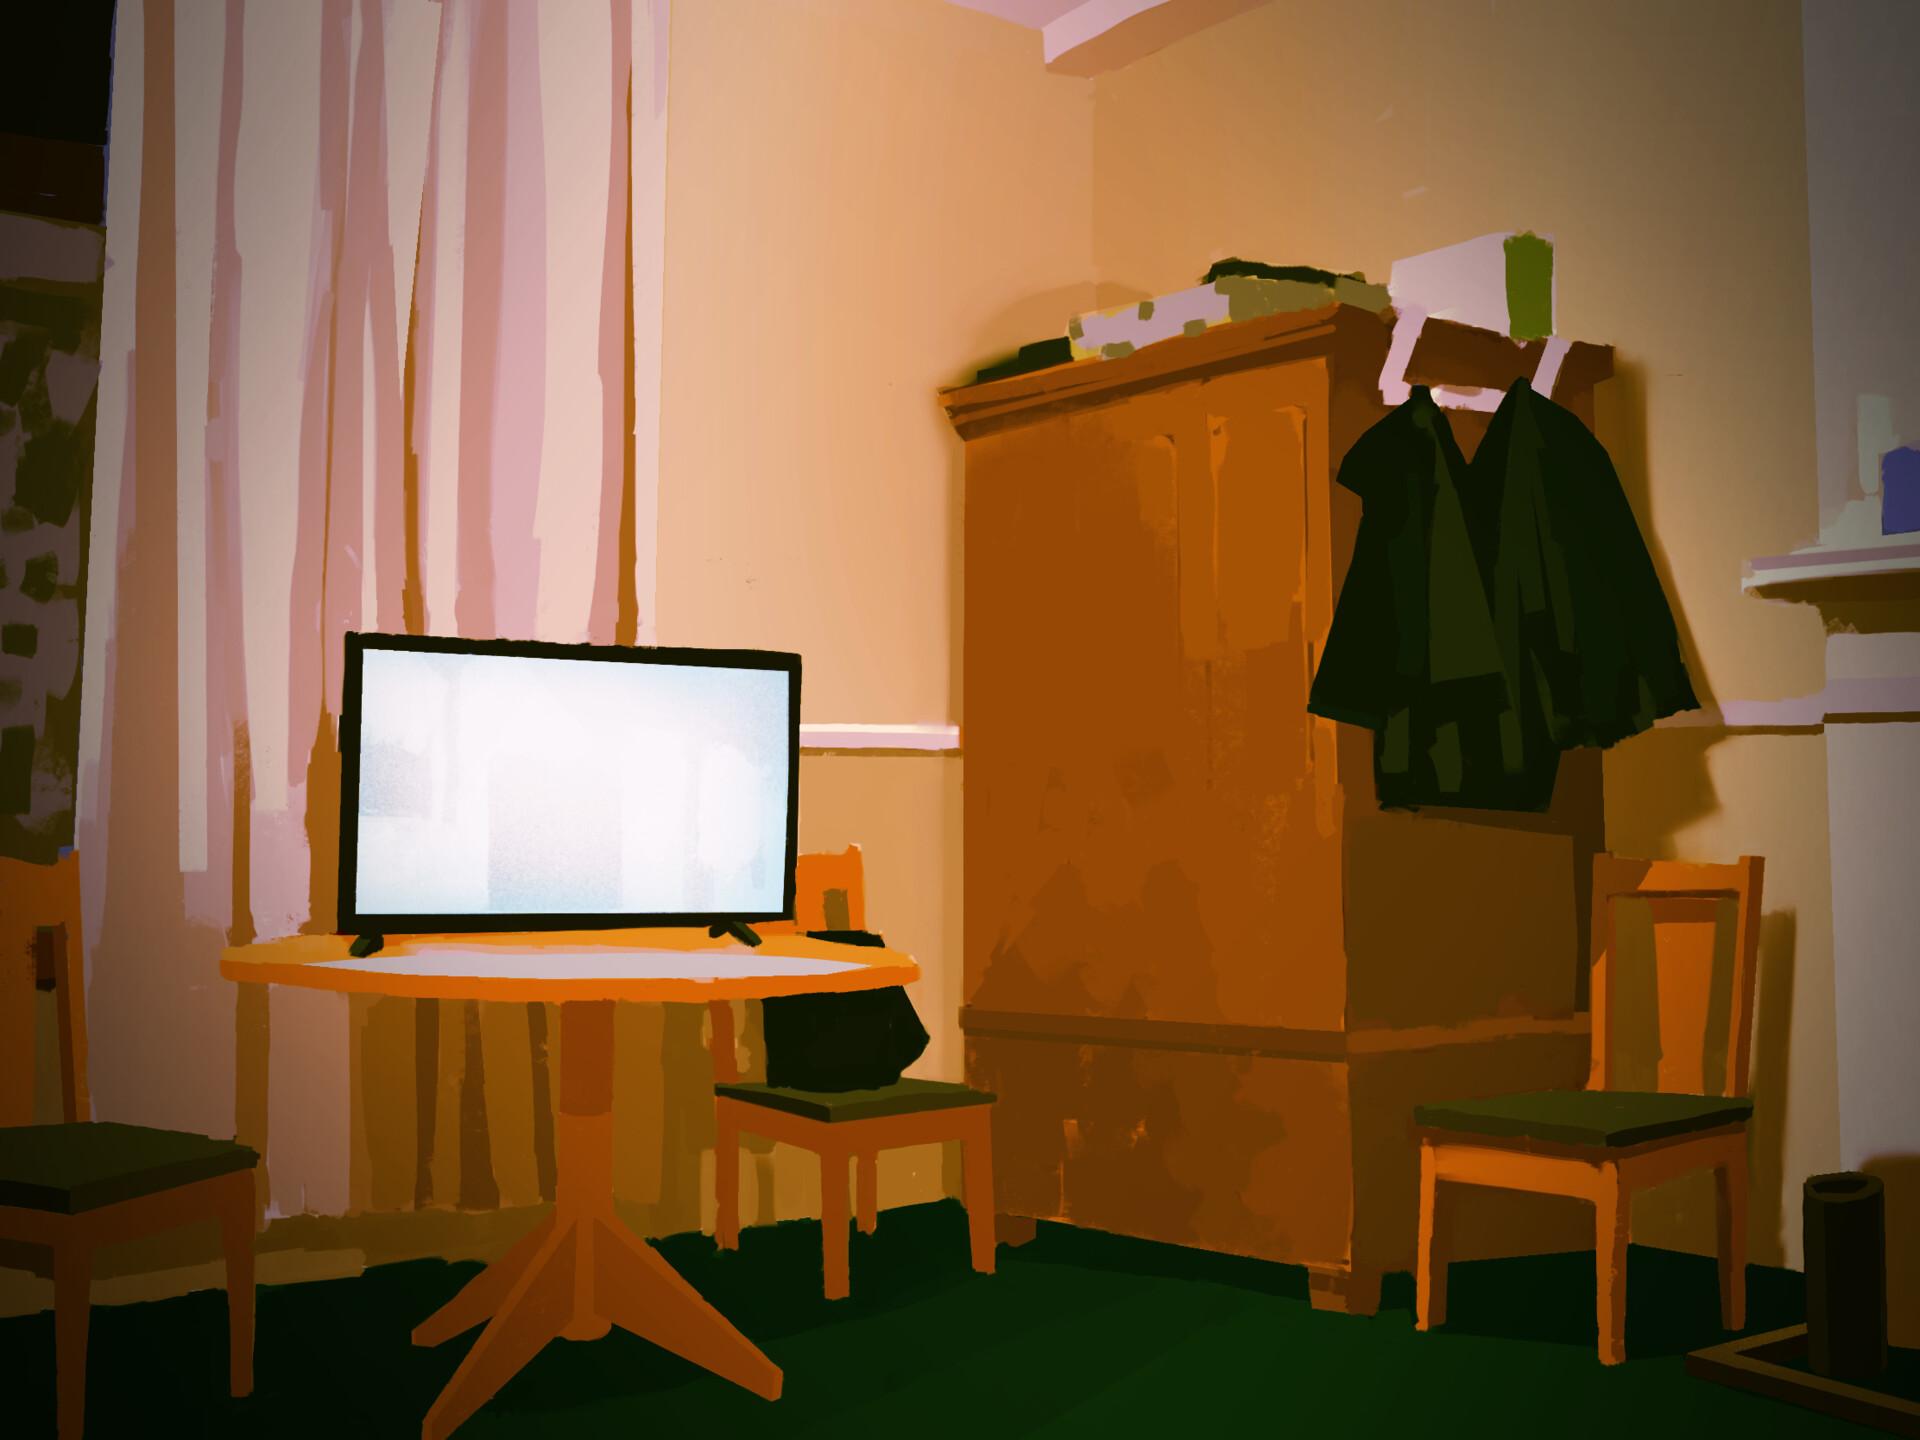 Piotr bzdura 05 room